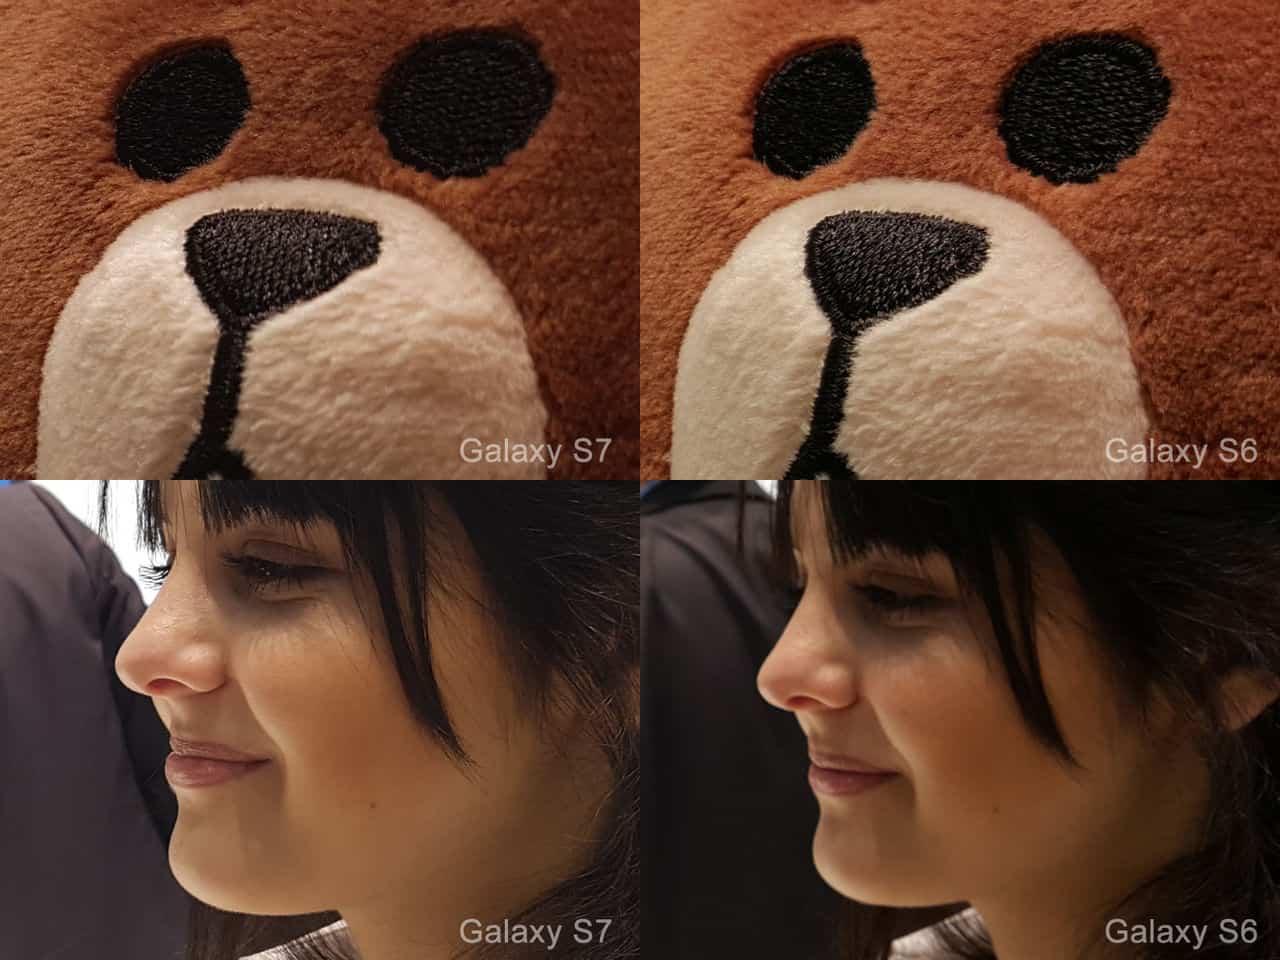 Samsung galaxy s7 vs lg g5 vs apple iphone 6s vs samsung galaxy s6 - Camera Vergelijking Samsung Galaxy S7 Versus Iphone 6s En Lg G5 En Meer